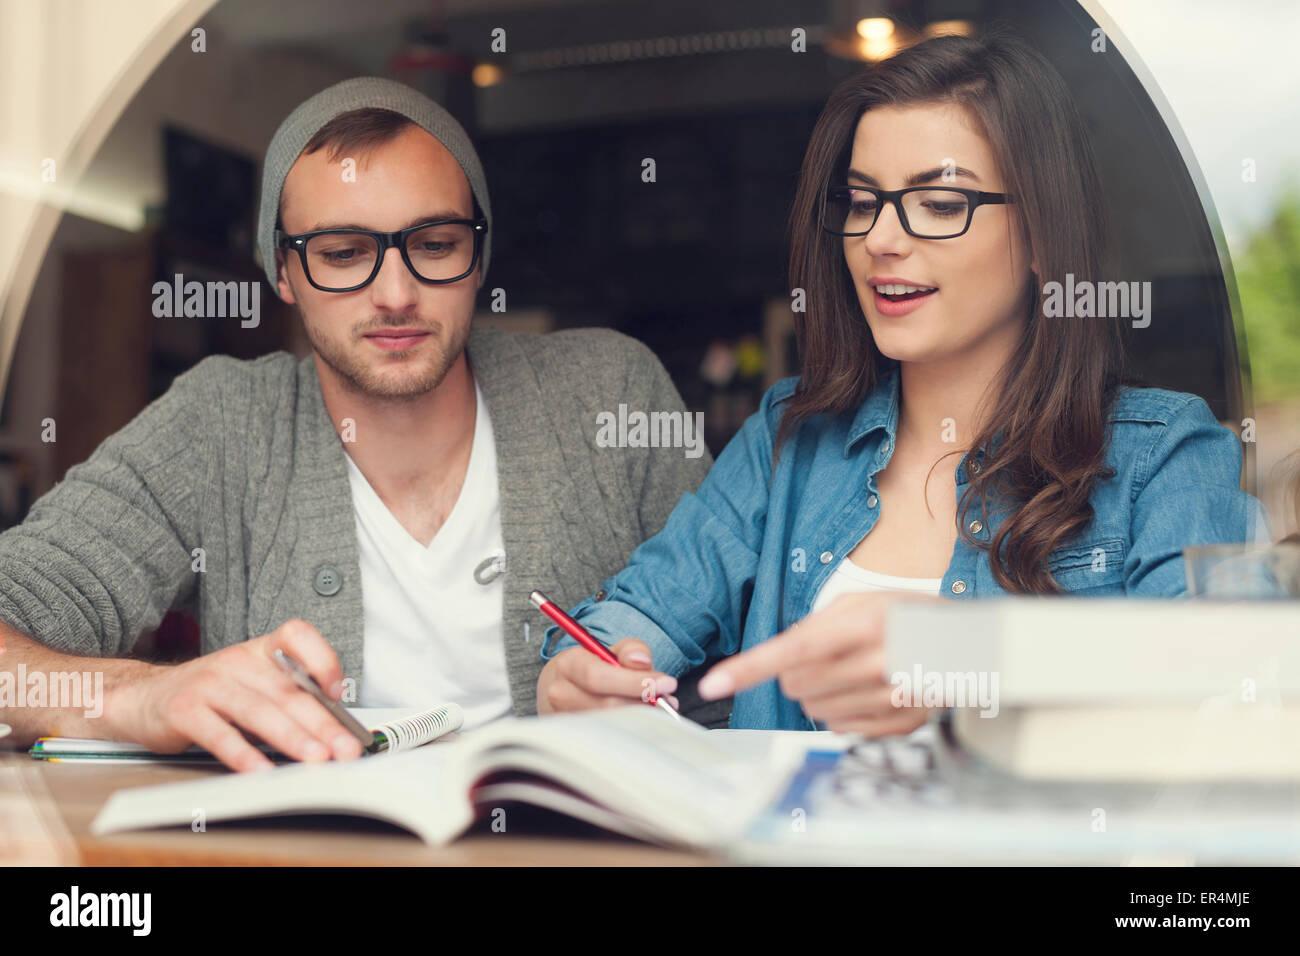 Hipster junges Paar im Café gemeinsam studieren. Krakau, Polen Stockbild